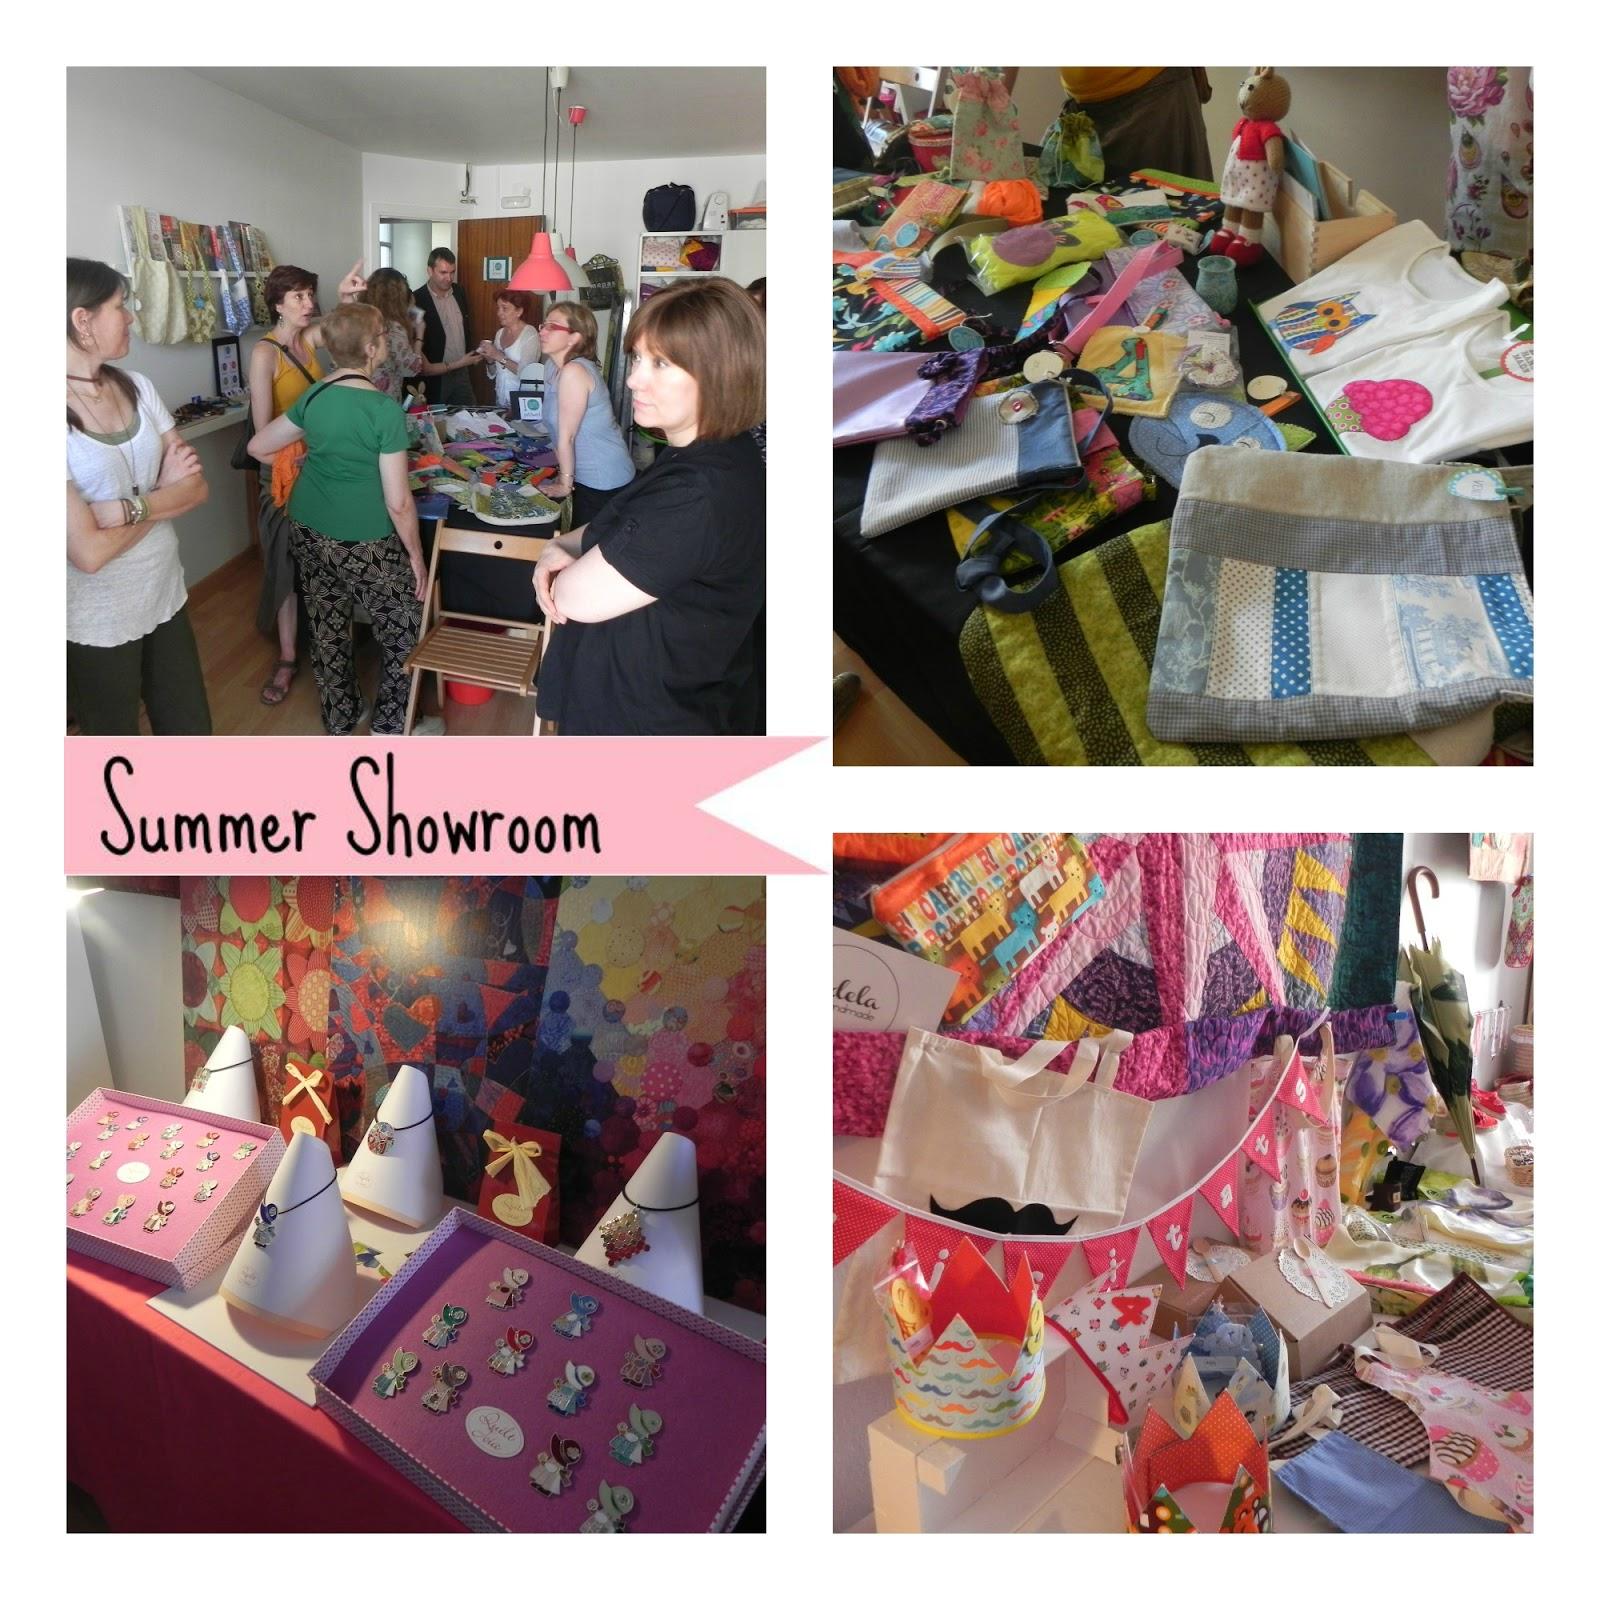 Summer Showroom